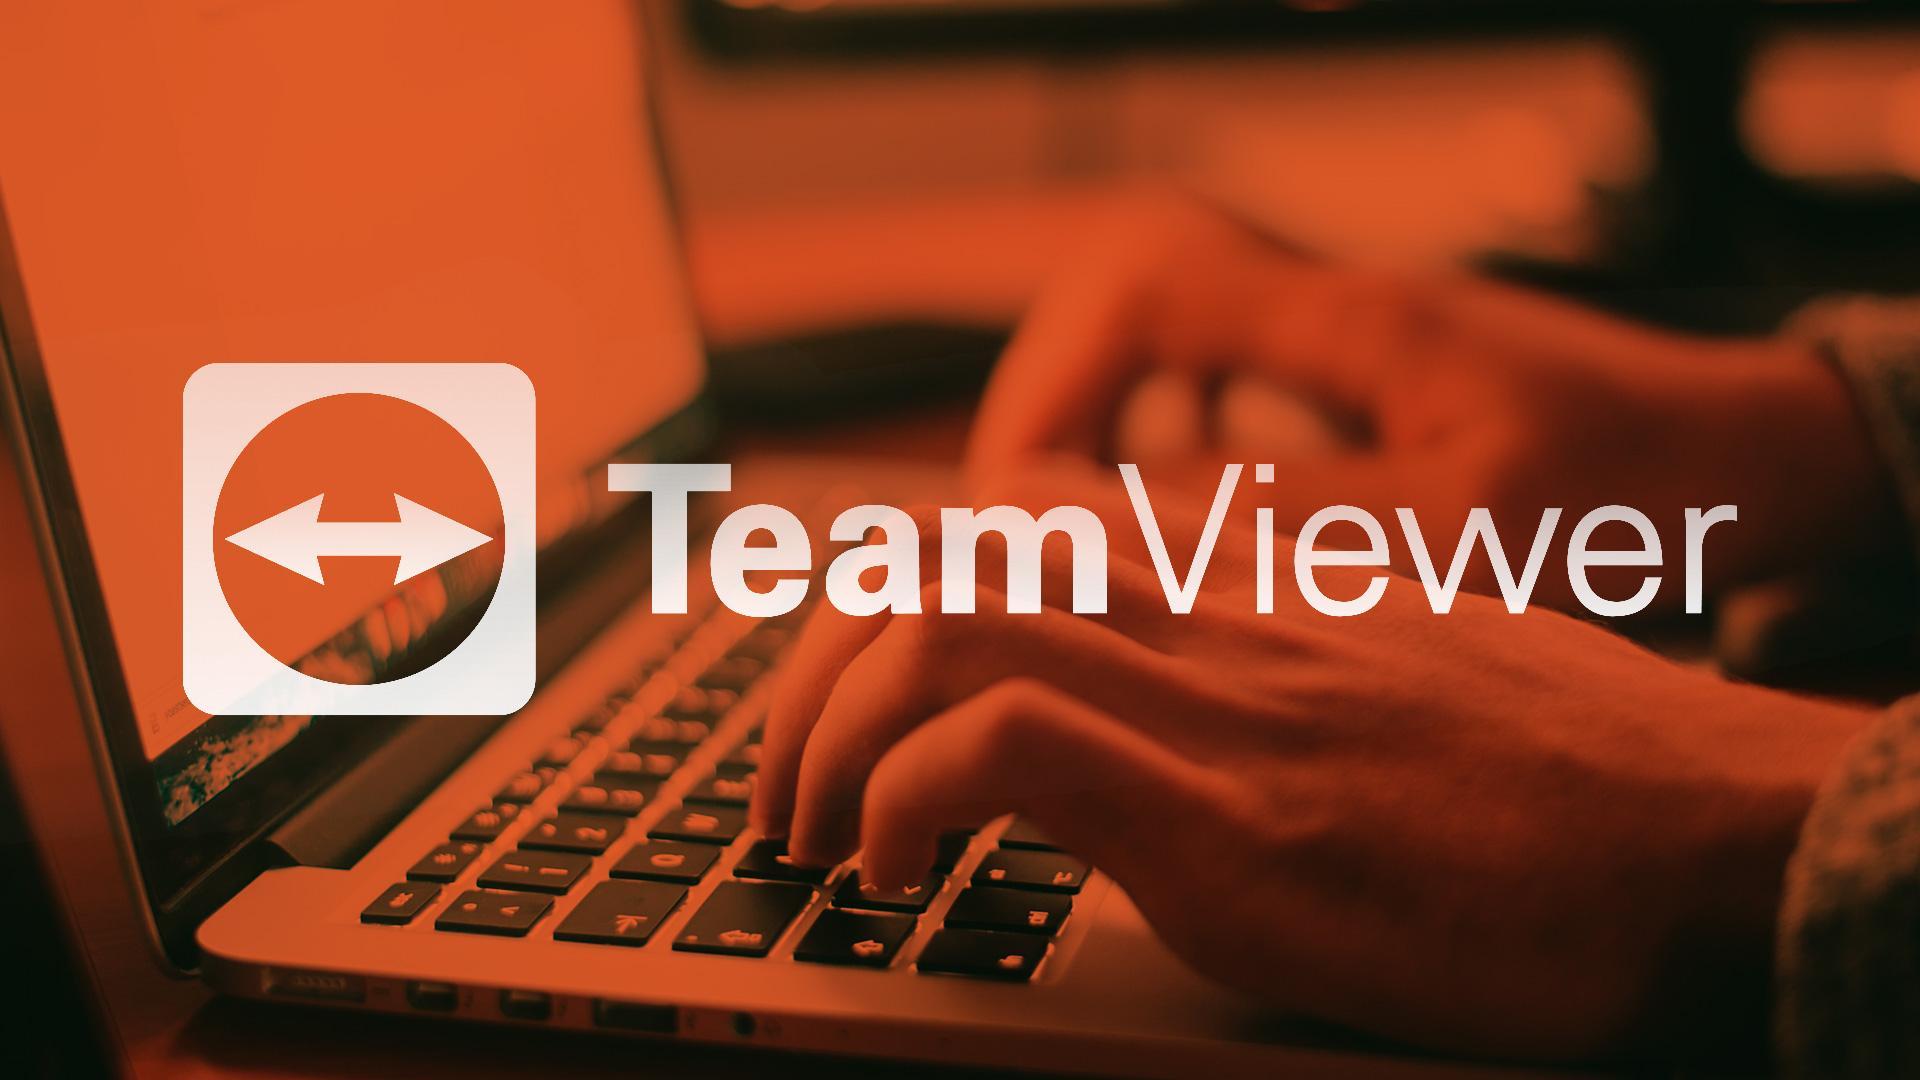 support-teamviewer.jpg